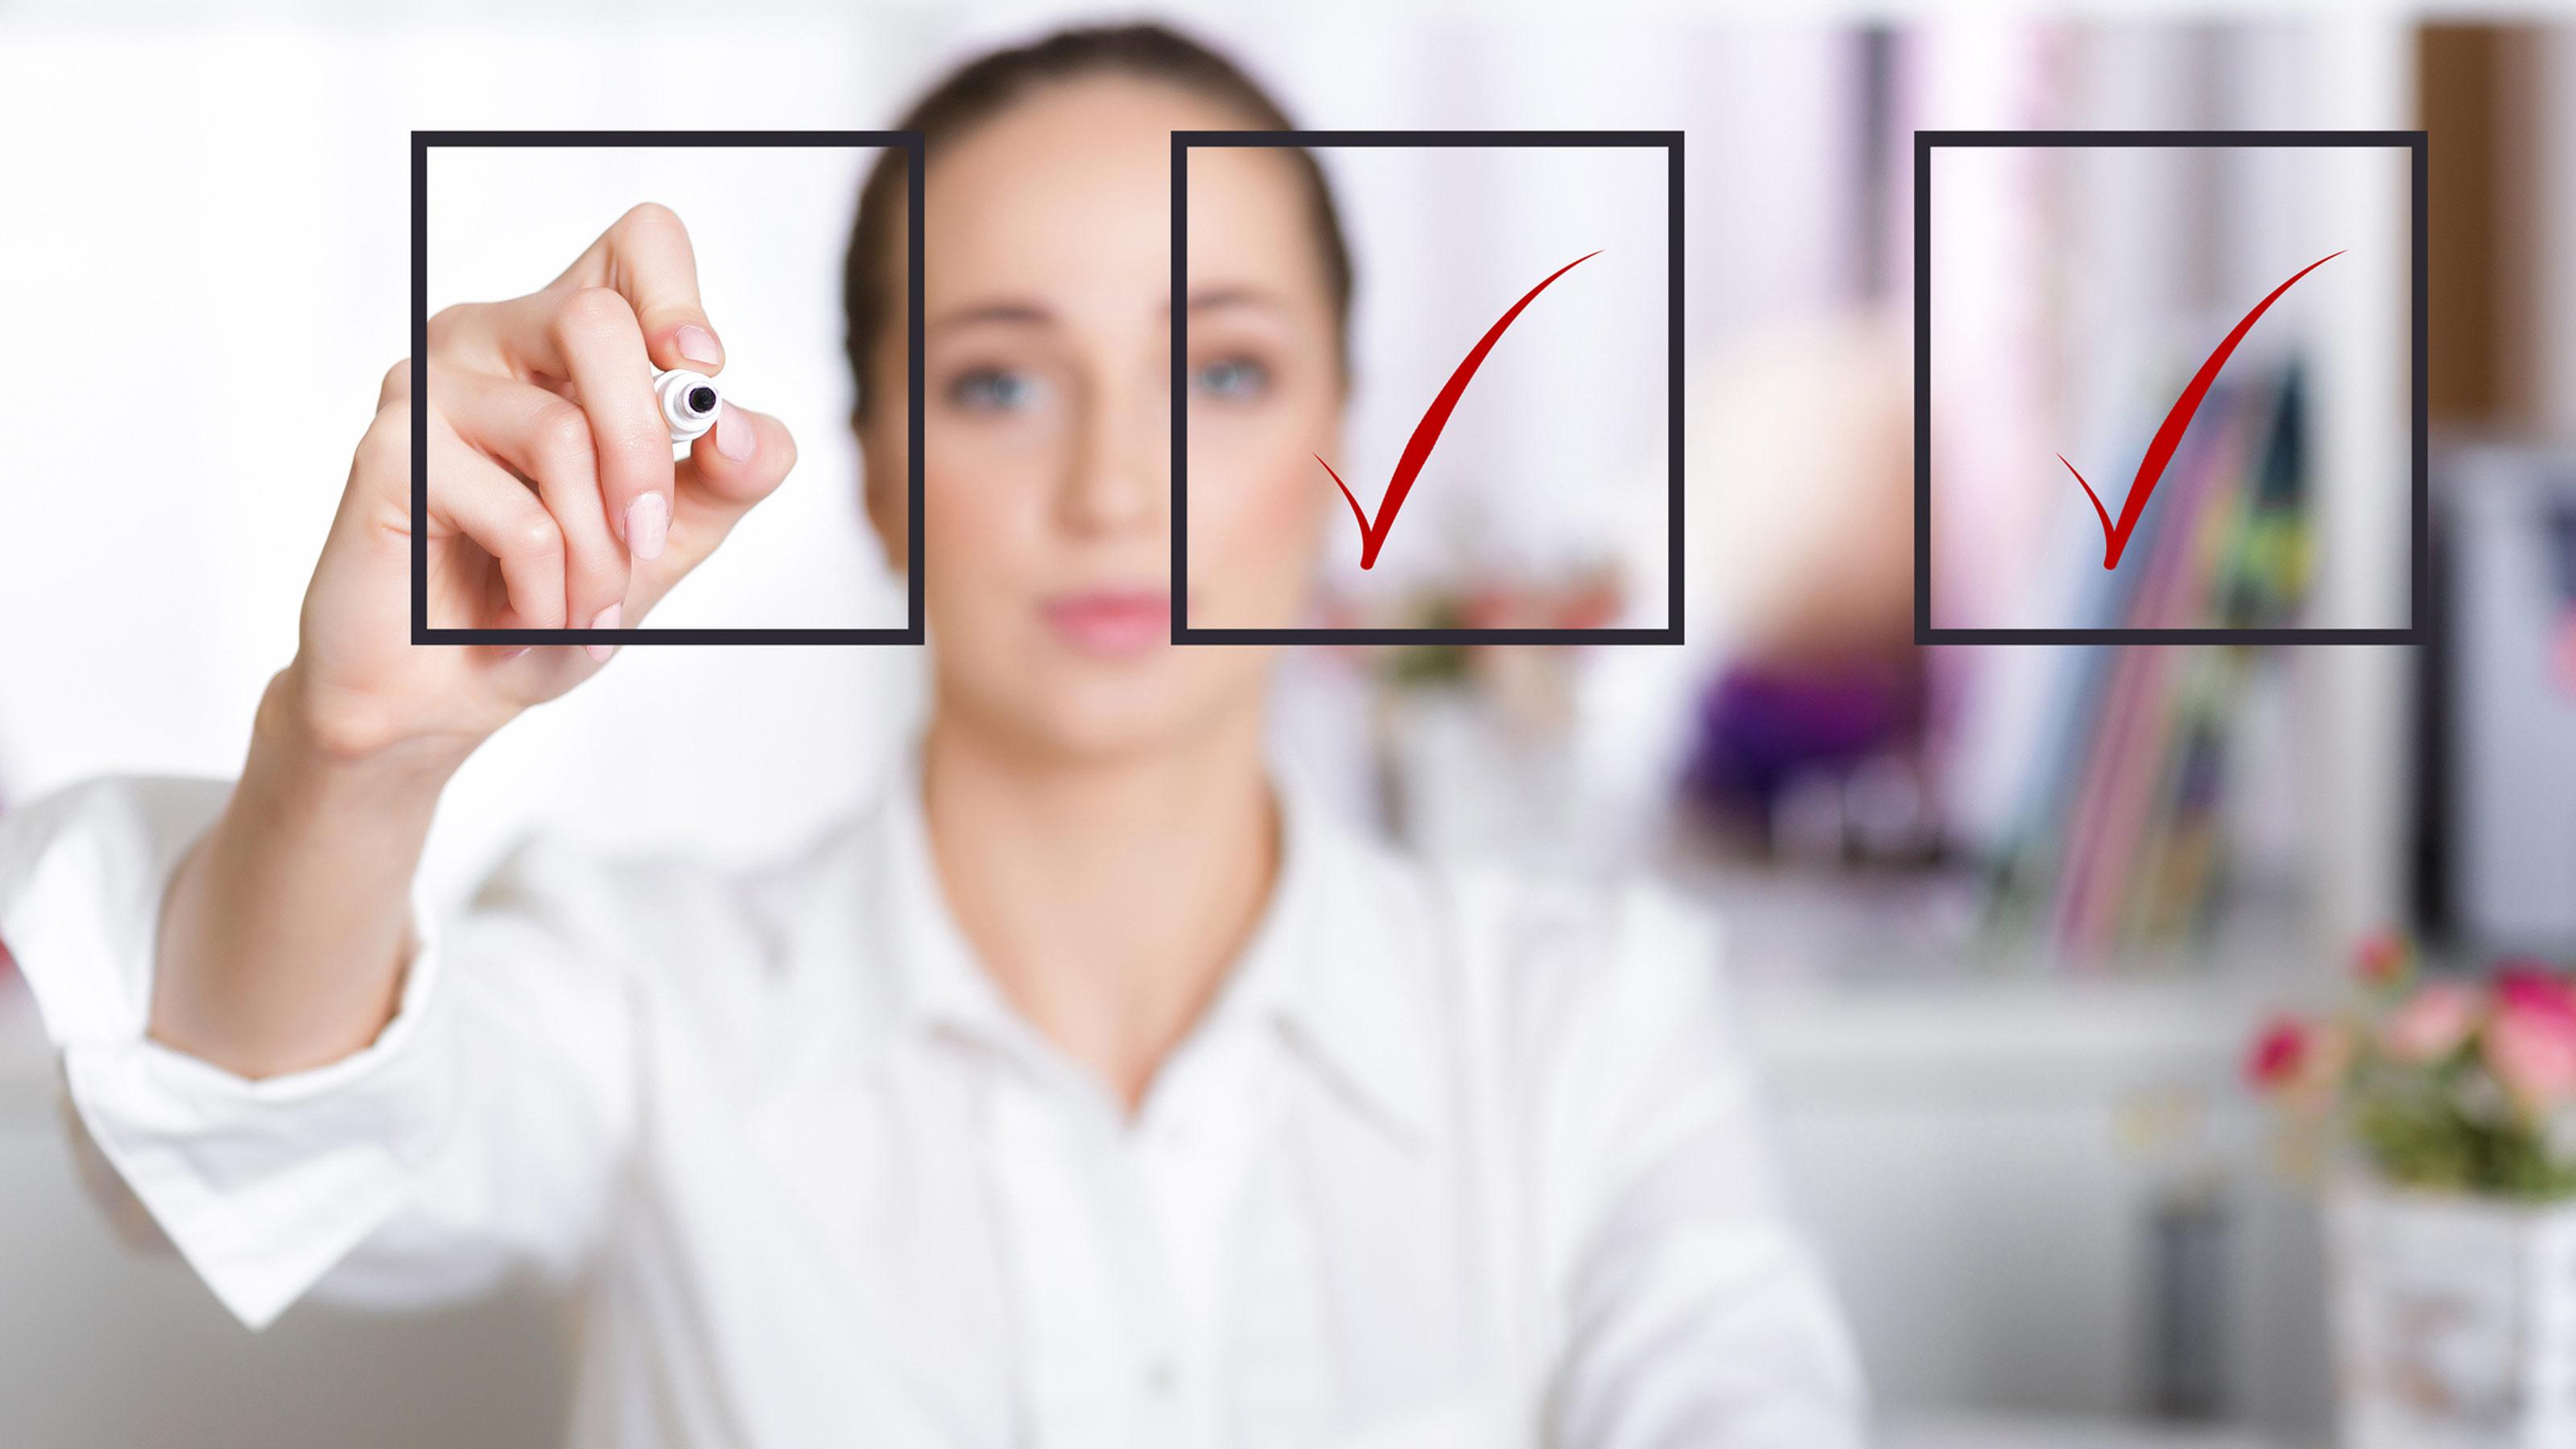 Estate Planning Checklist: 5 Tasks to Do Now, While You're Still Well | Kiplinger